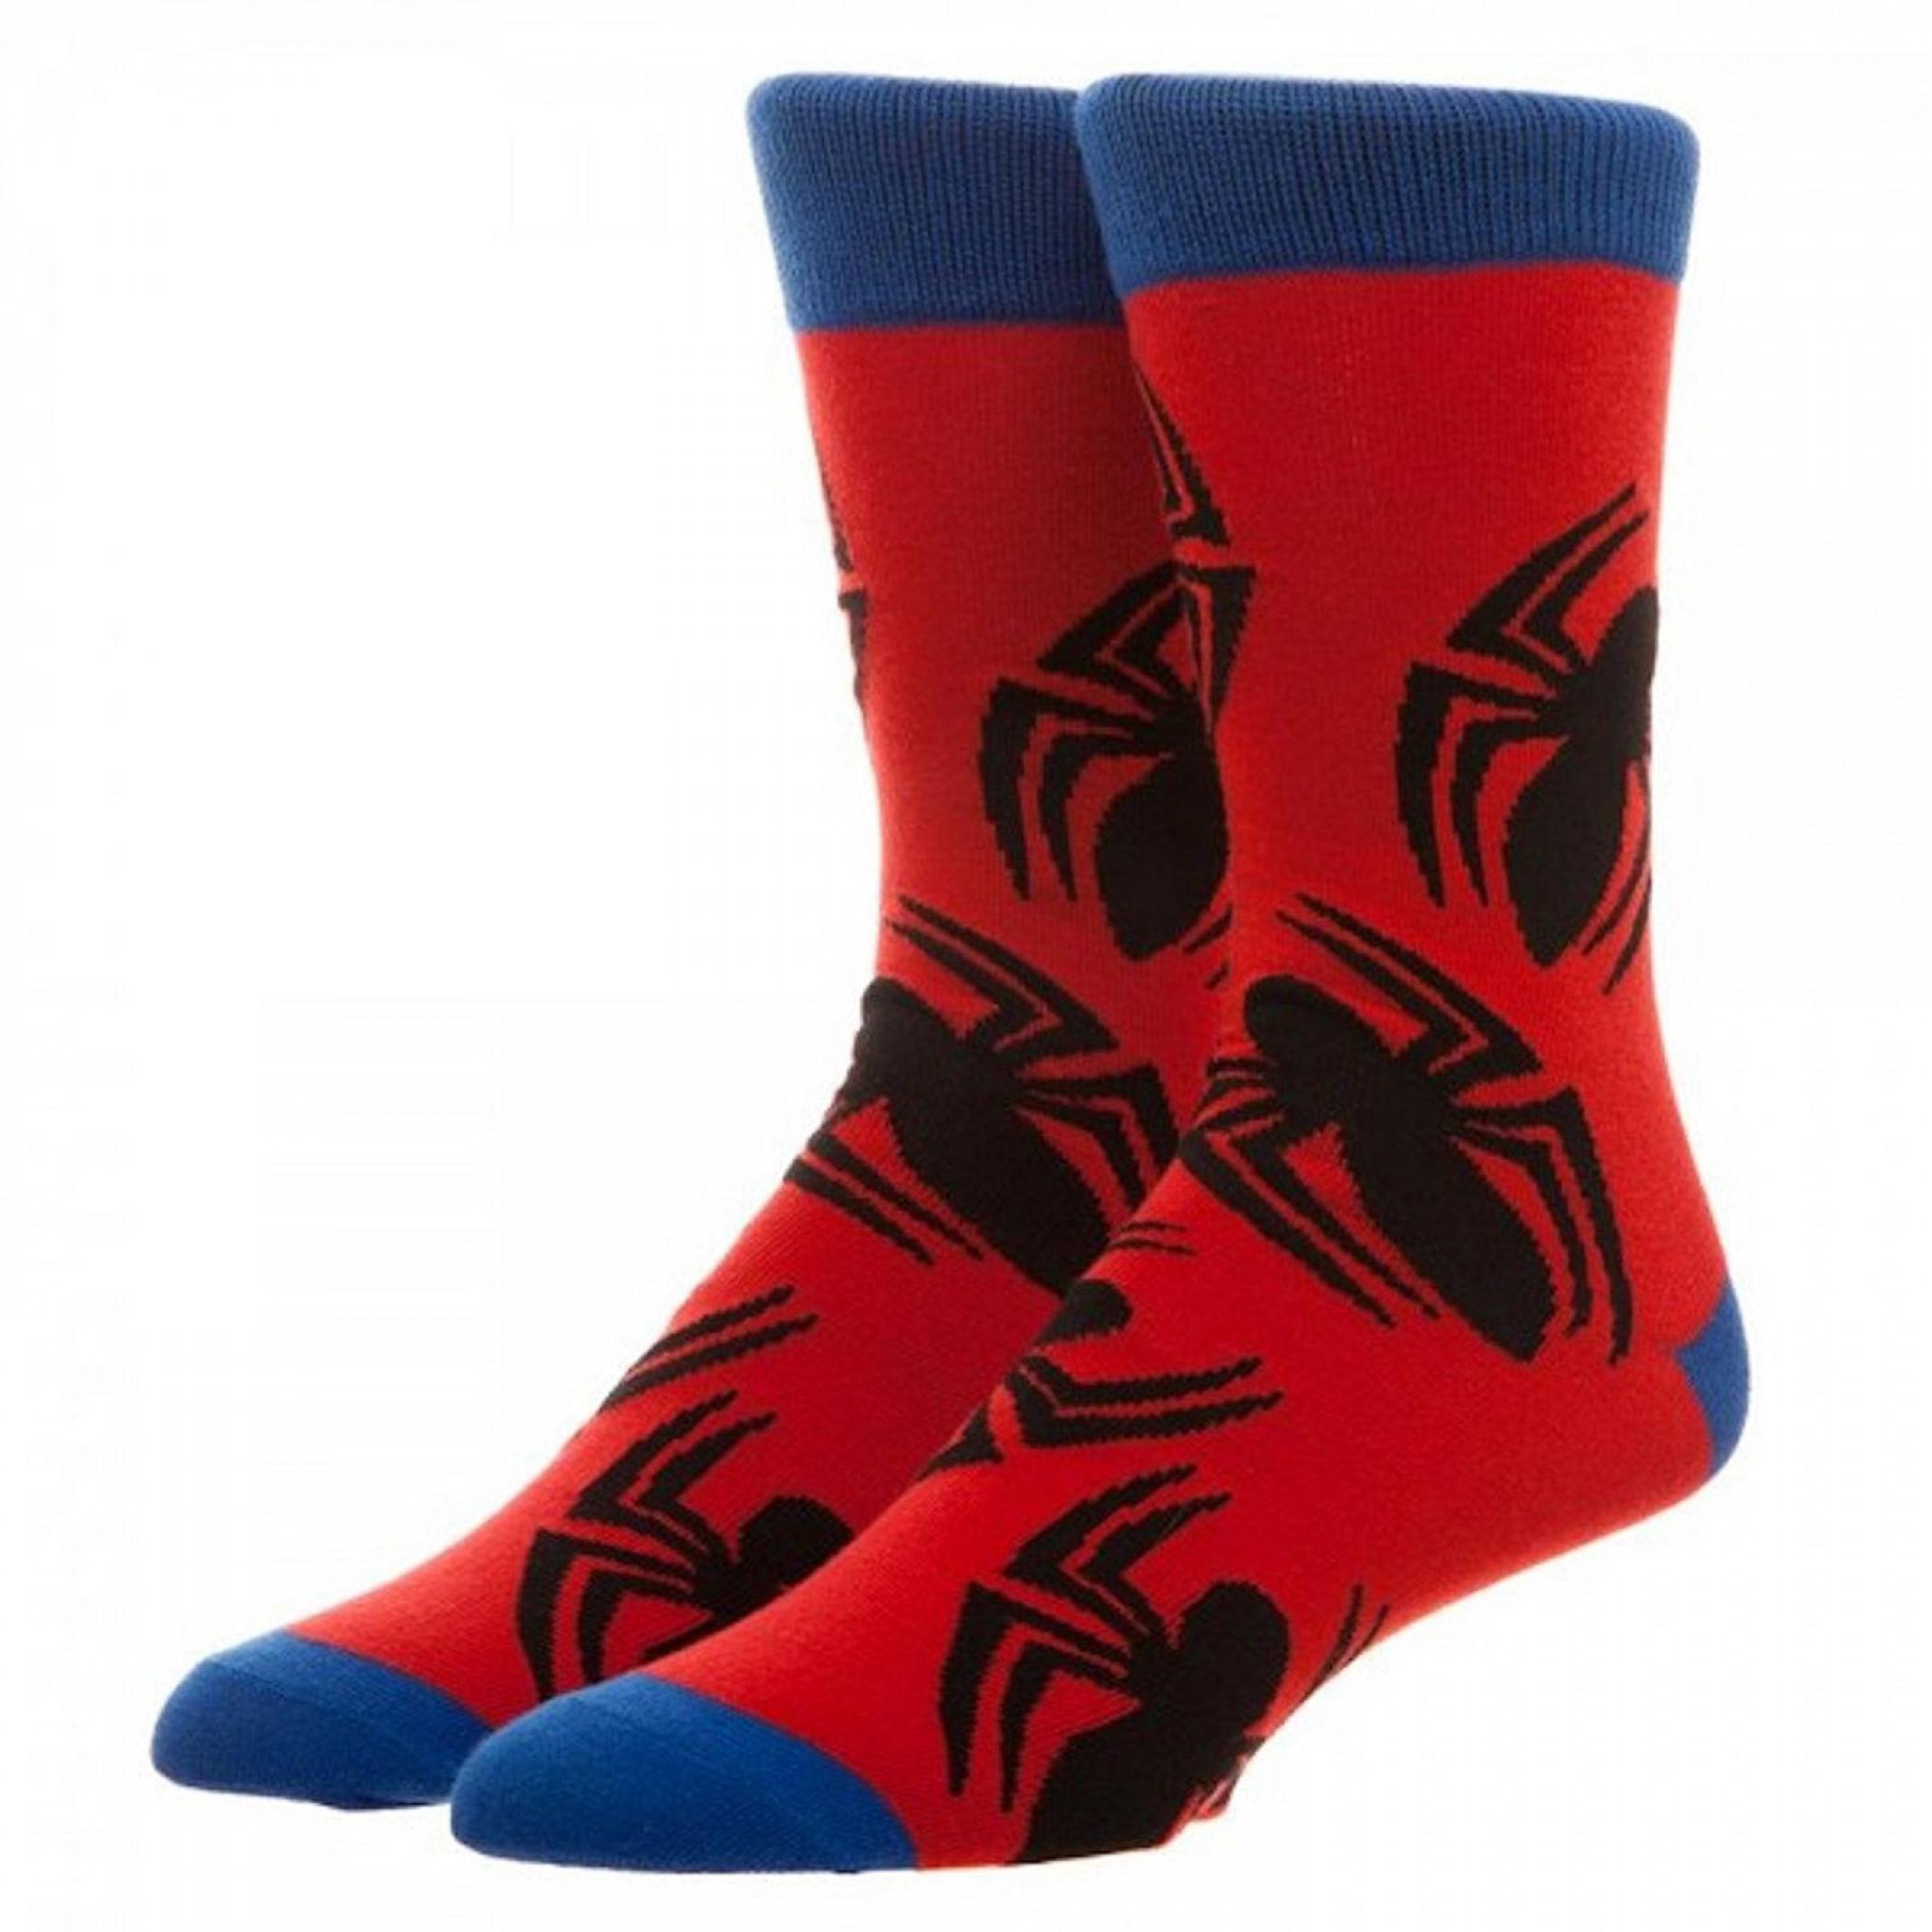 Spiderman Crew Socks